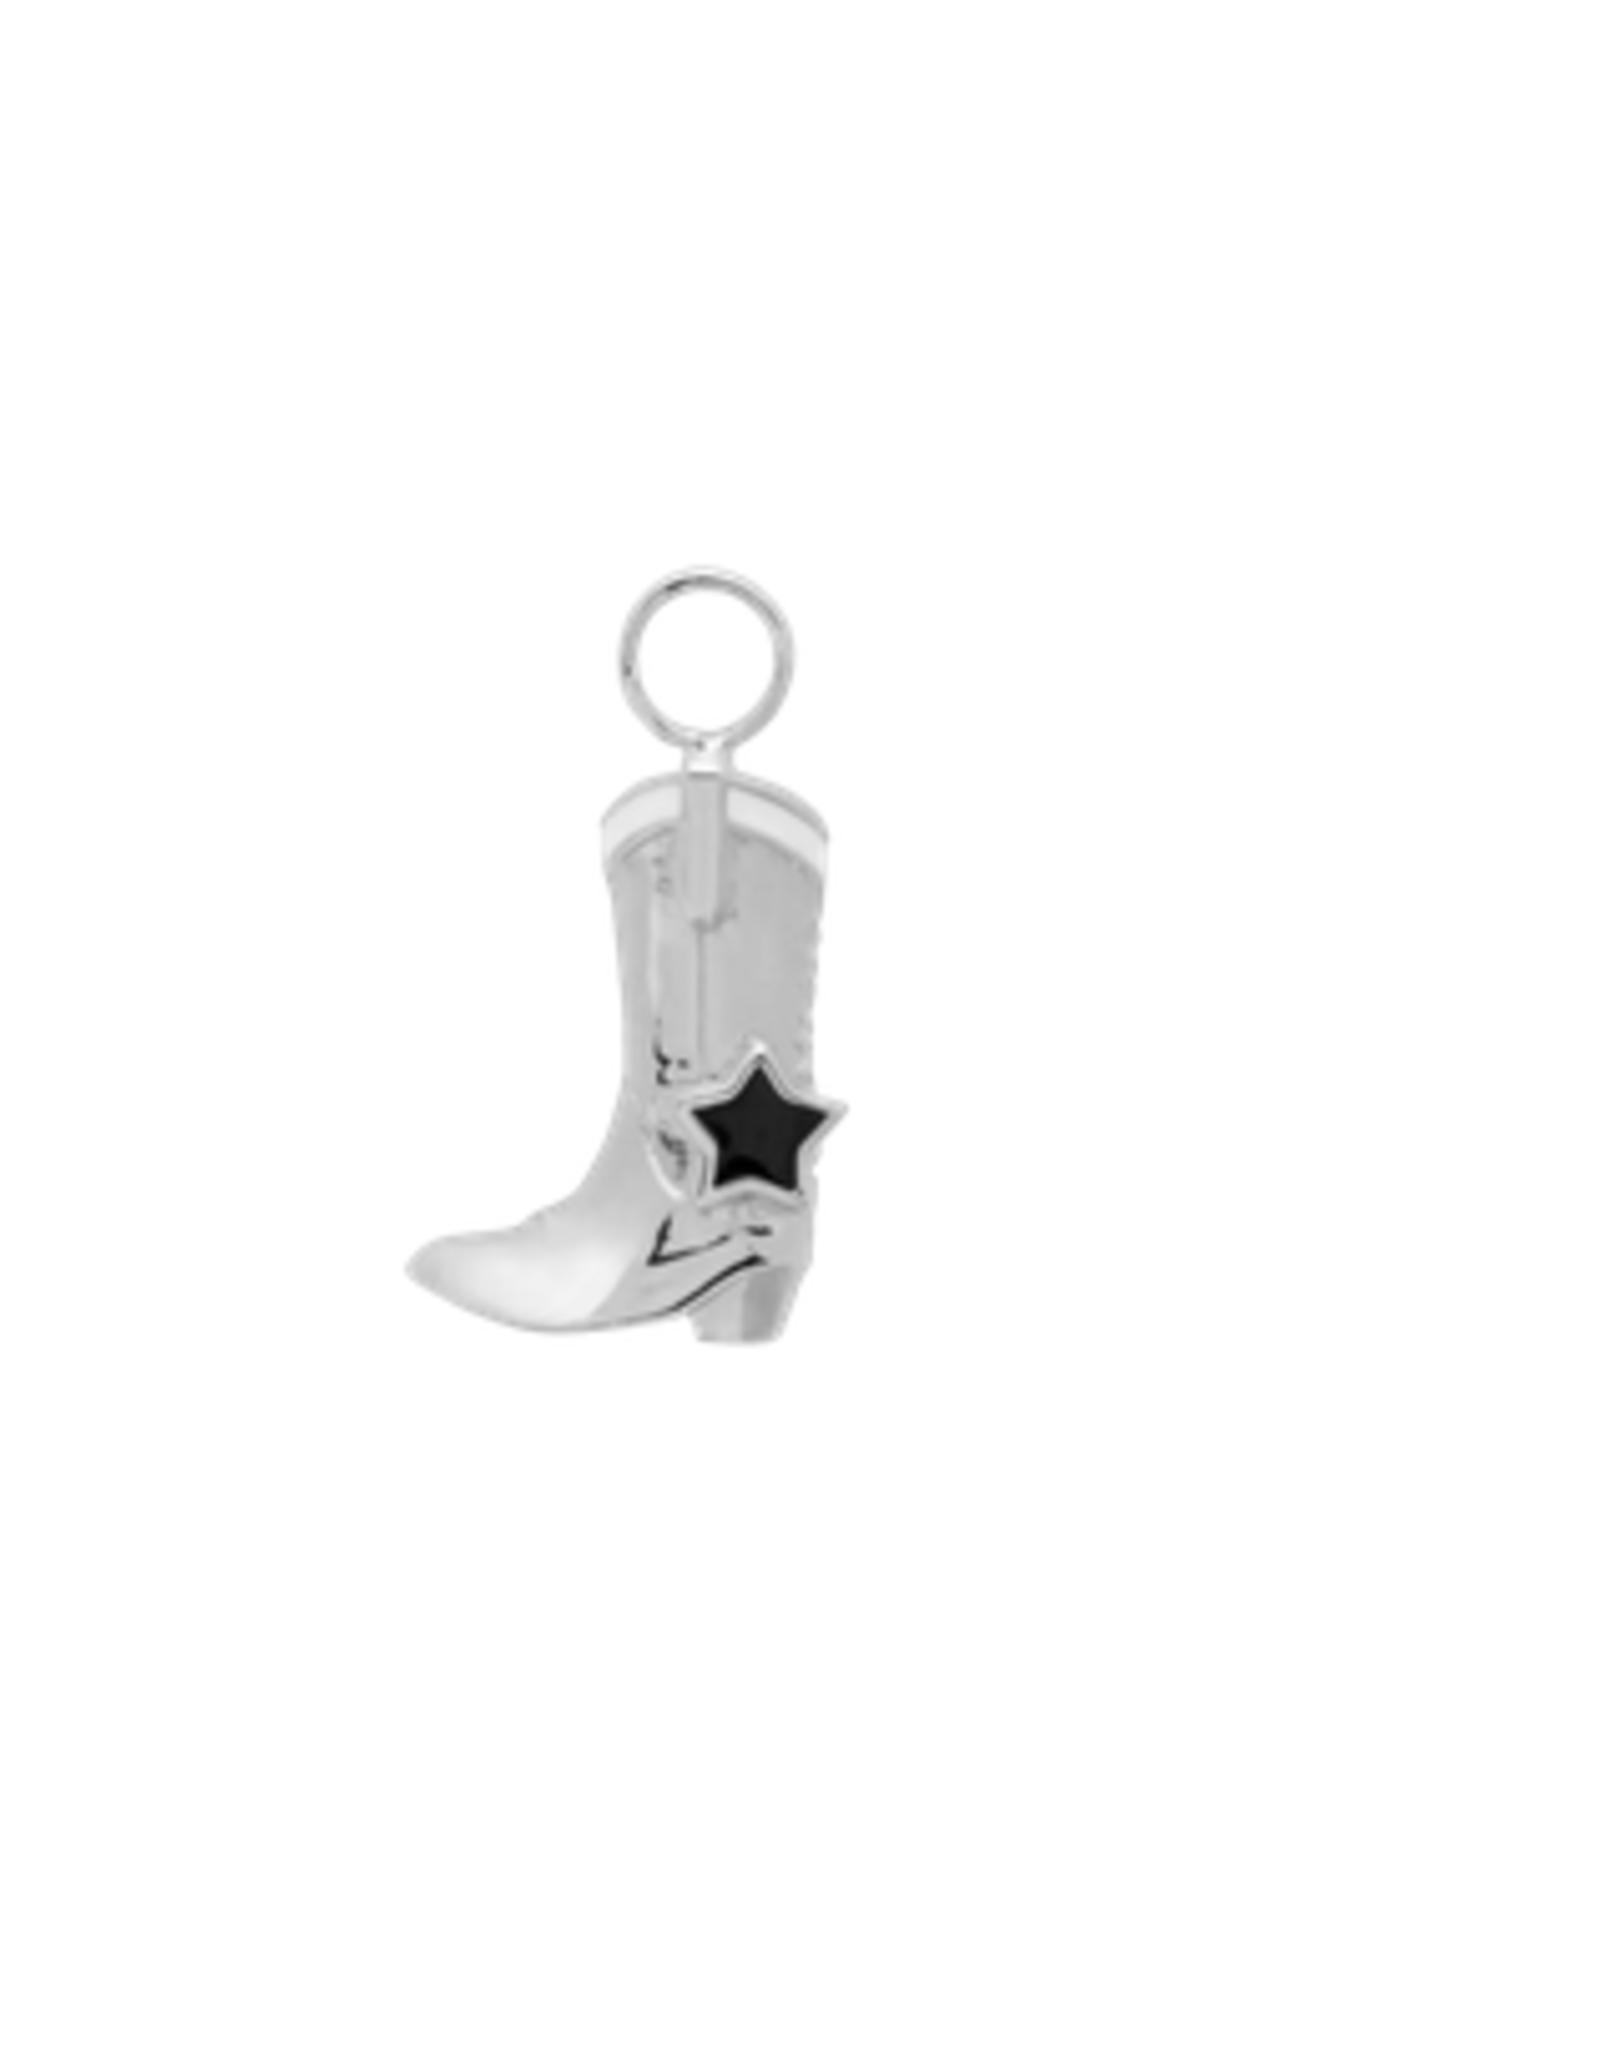 Anna + Nina Cowboy Boot Earring Charm Silver